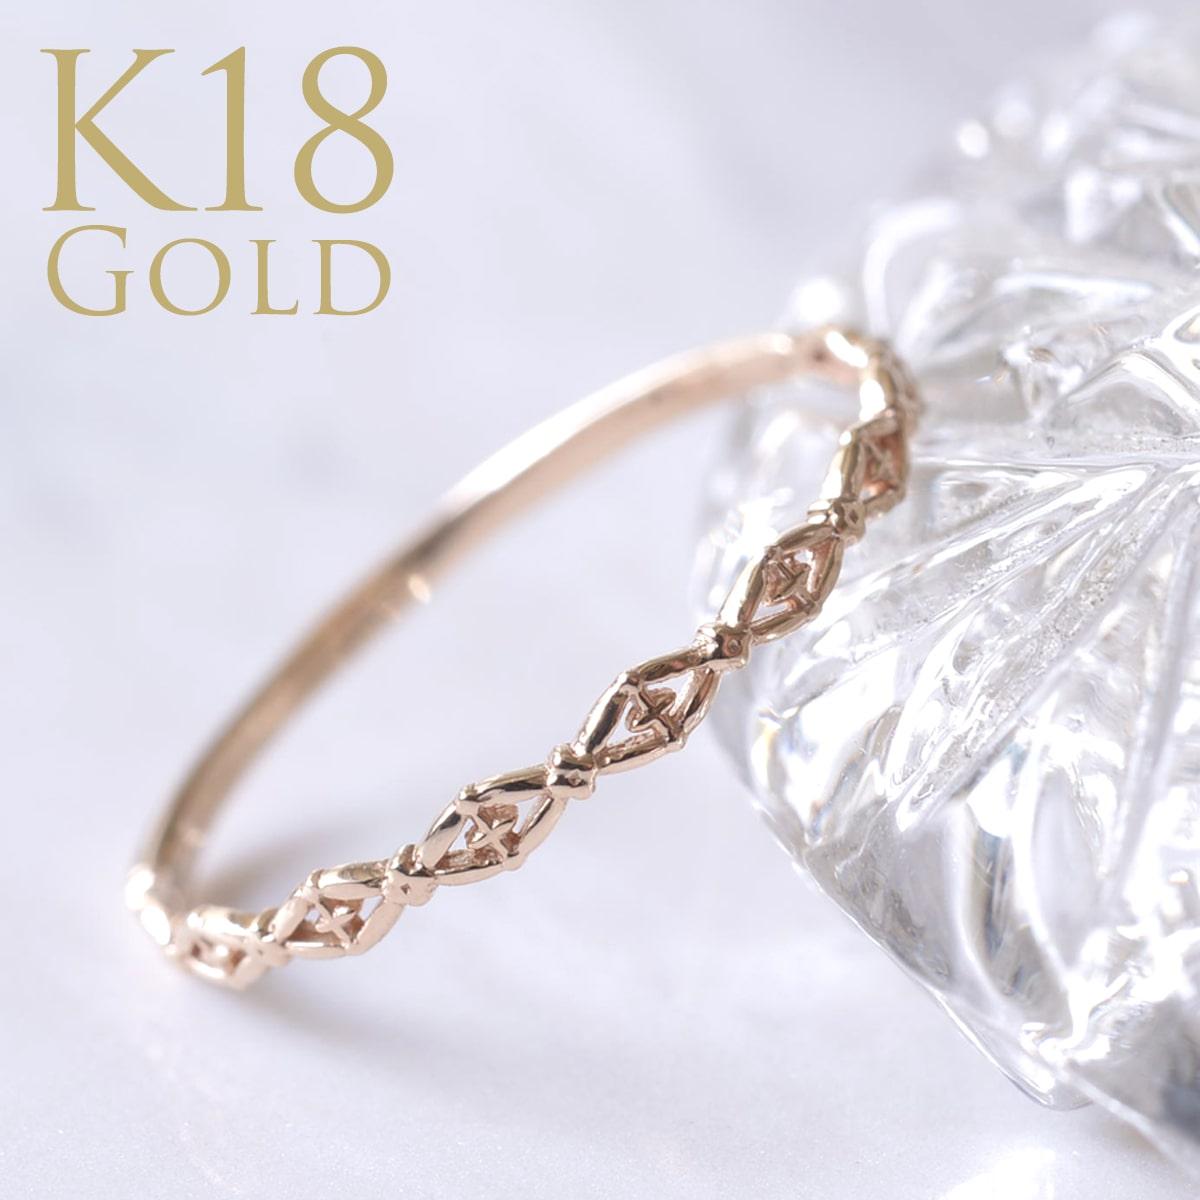 K18 リング 指輪 透かしクロスゴールドリング  (RERALUy)  華奢 新作/rri1678k18